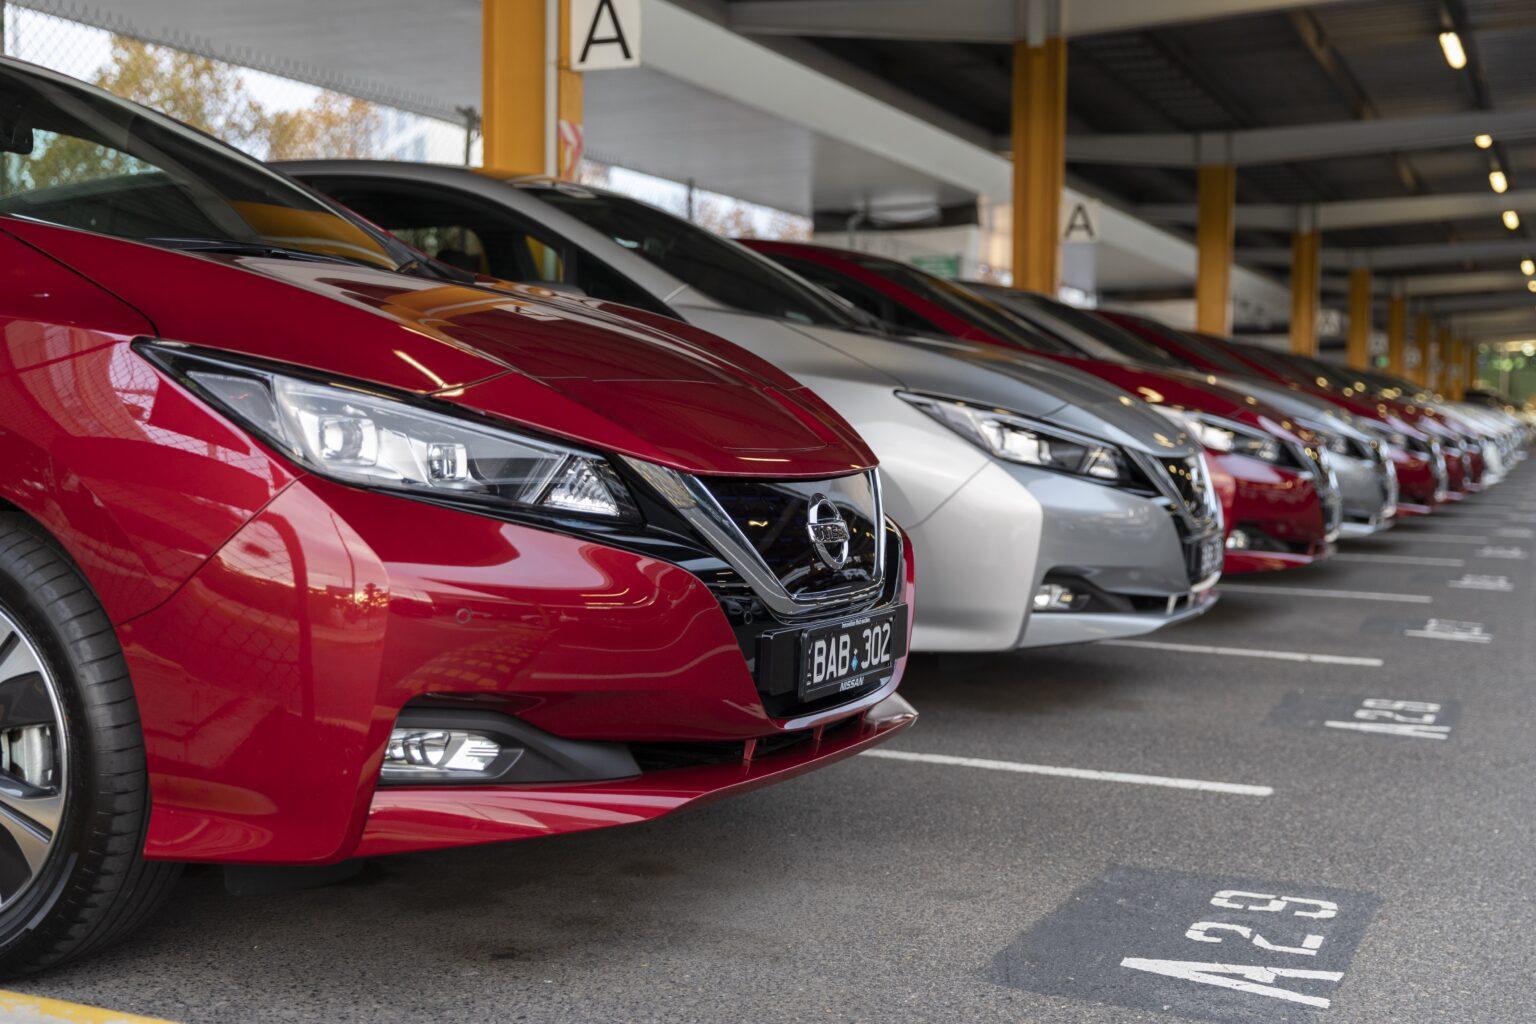 Row of Nissan Leaf cars